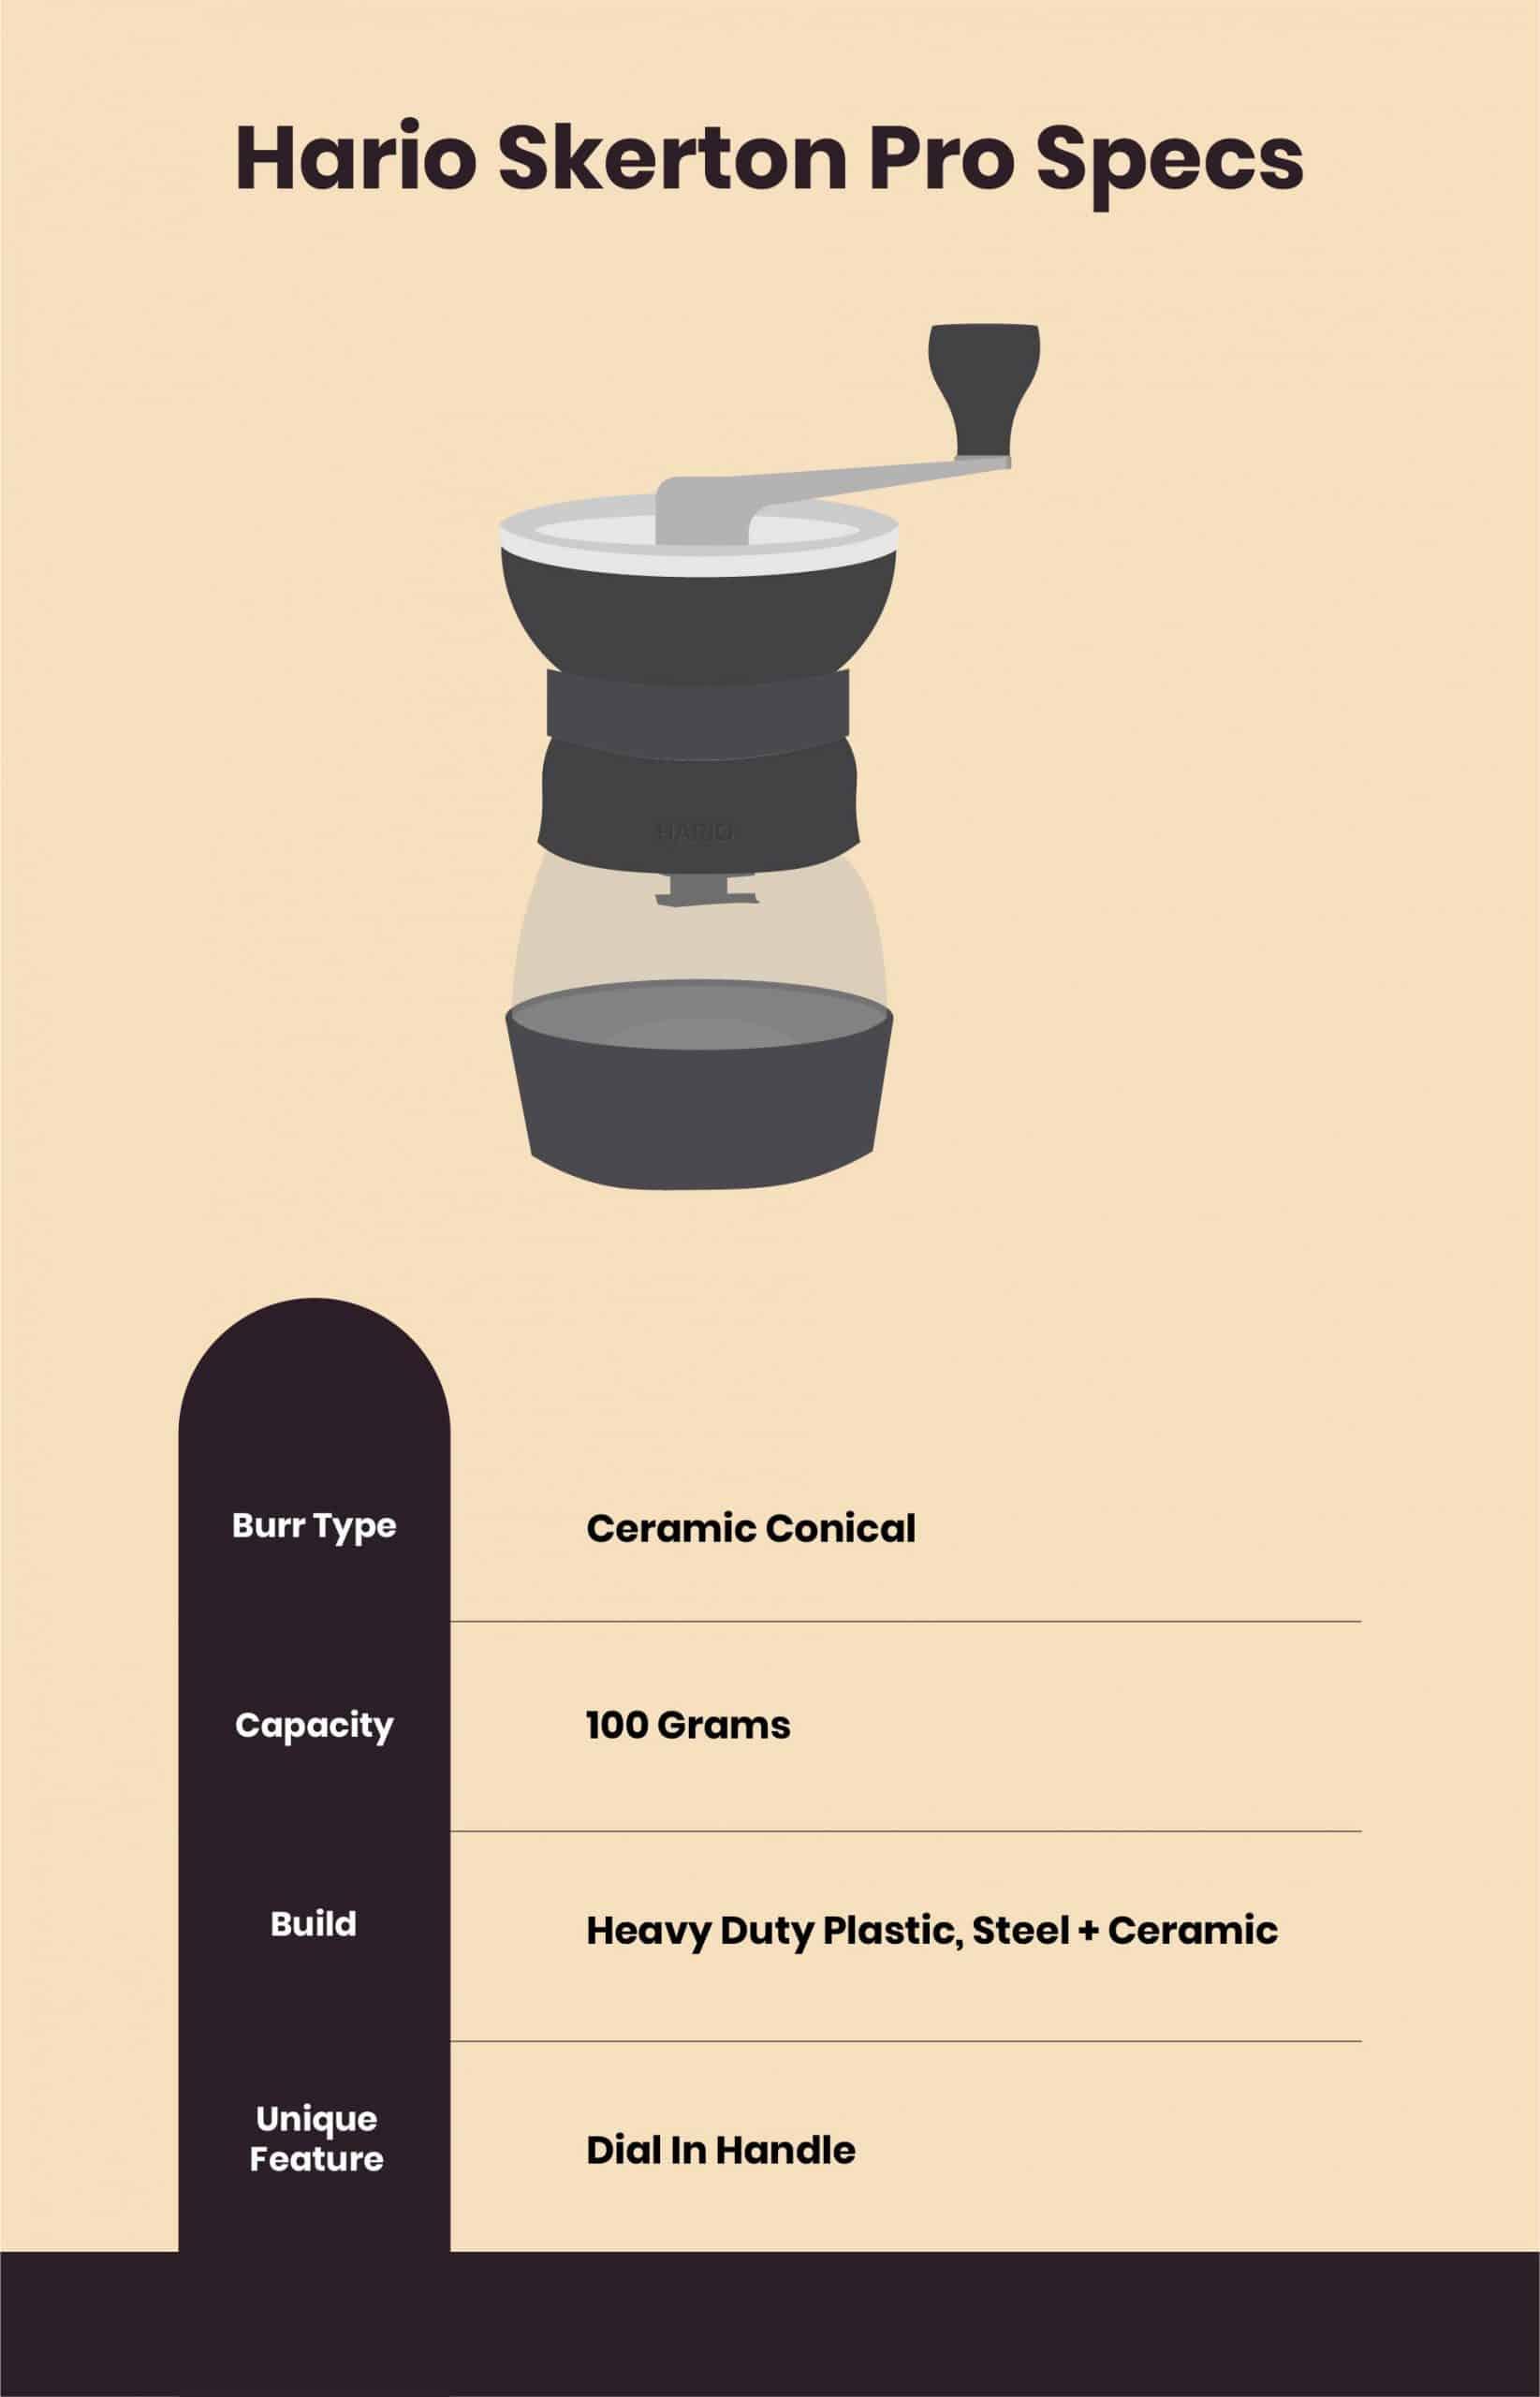 Hario Skerton Pro specs infographic